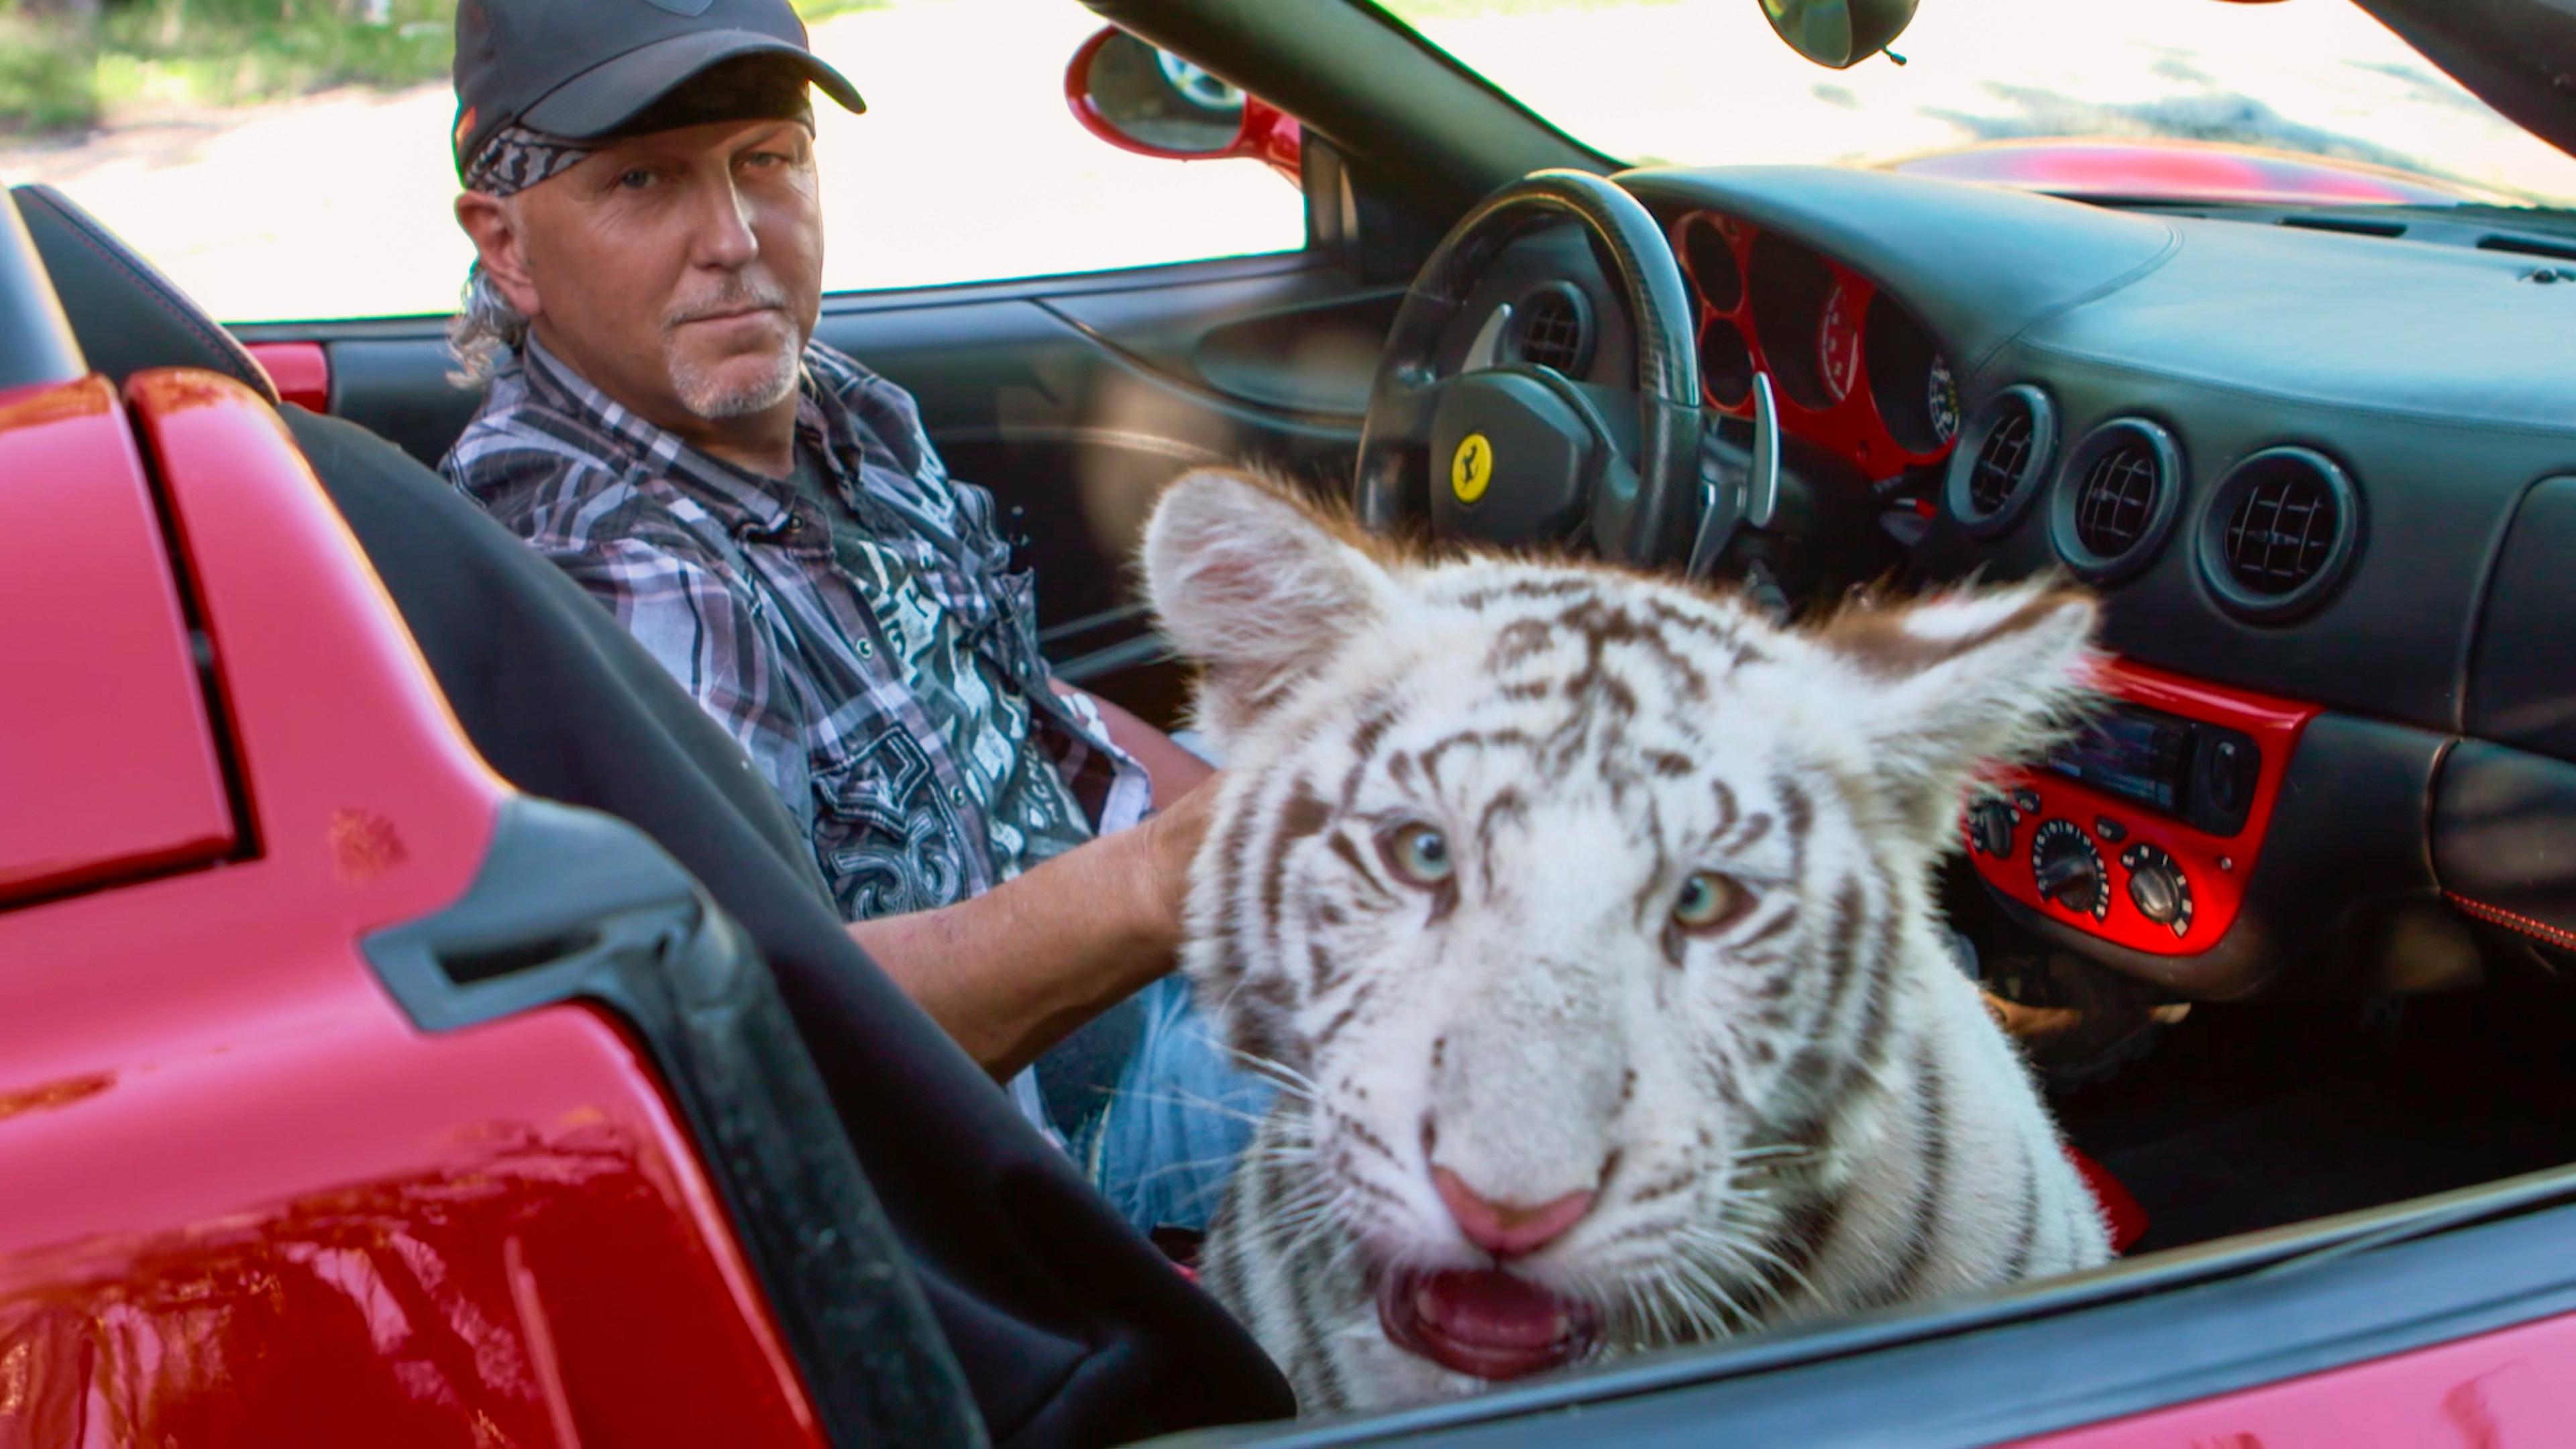 Król tygrysów